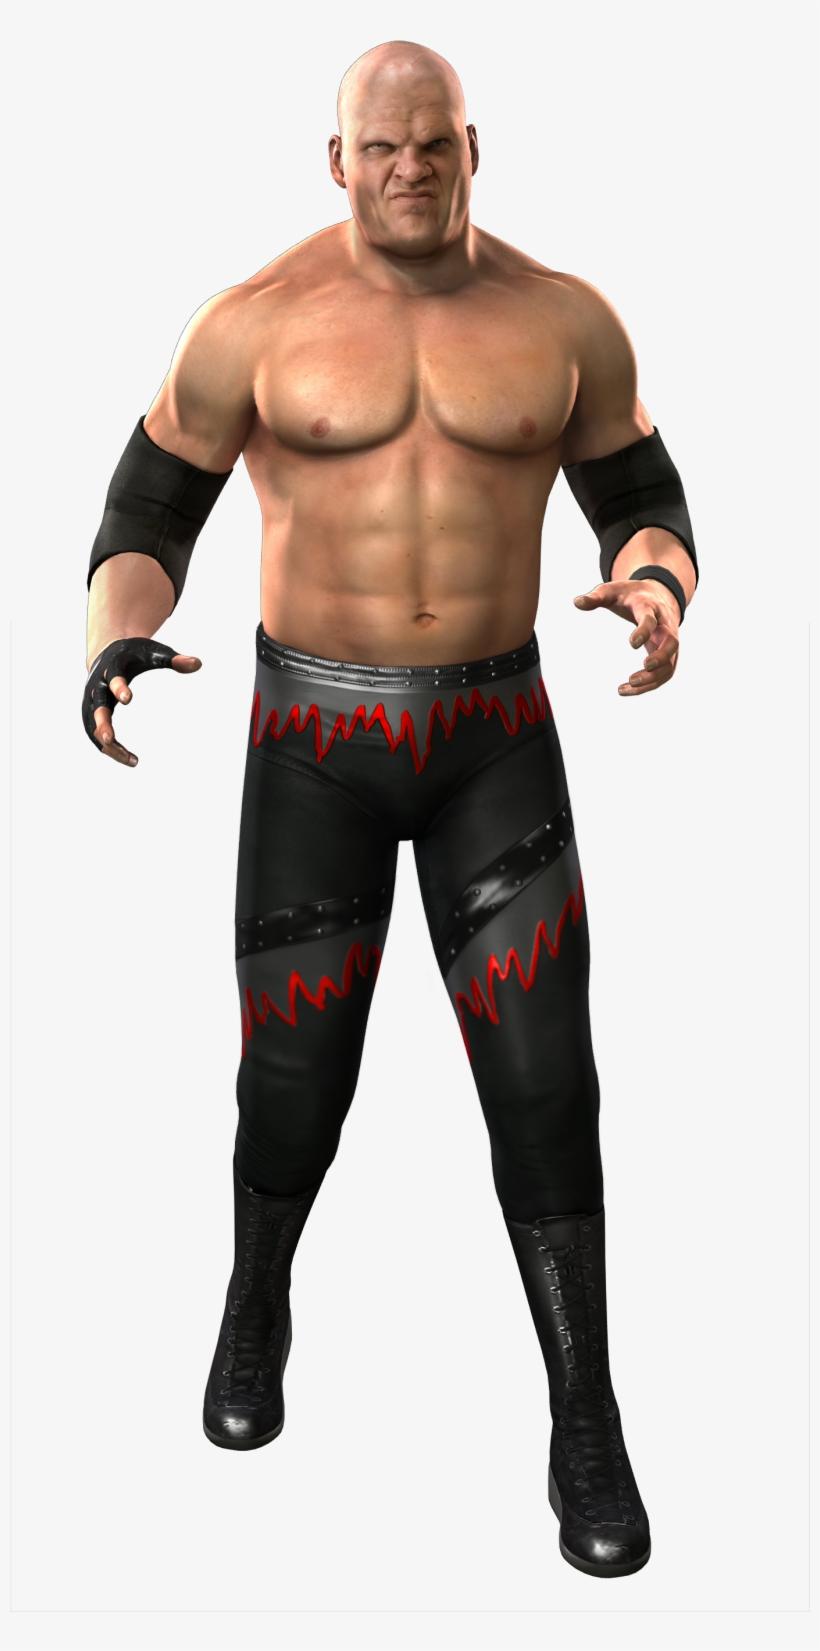 Kane Svr2011 Render - Smackdown Vs Raw 2011 Kane, transparent png #3231357